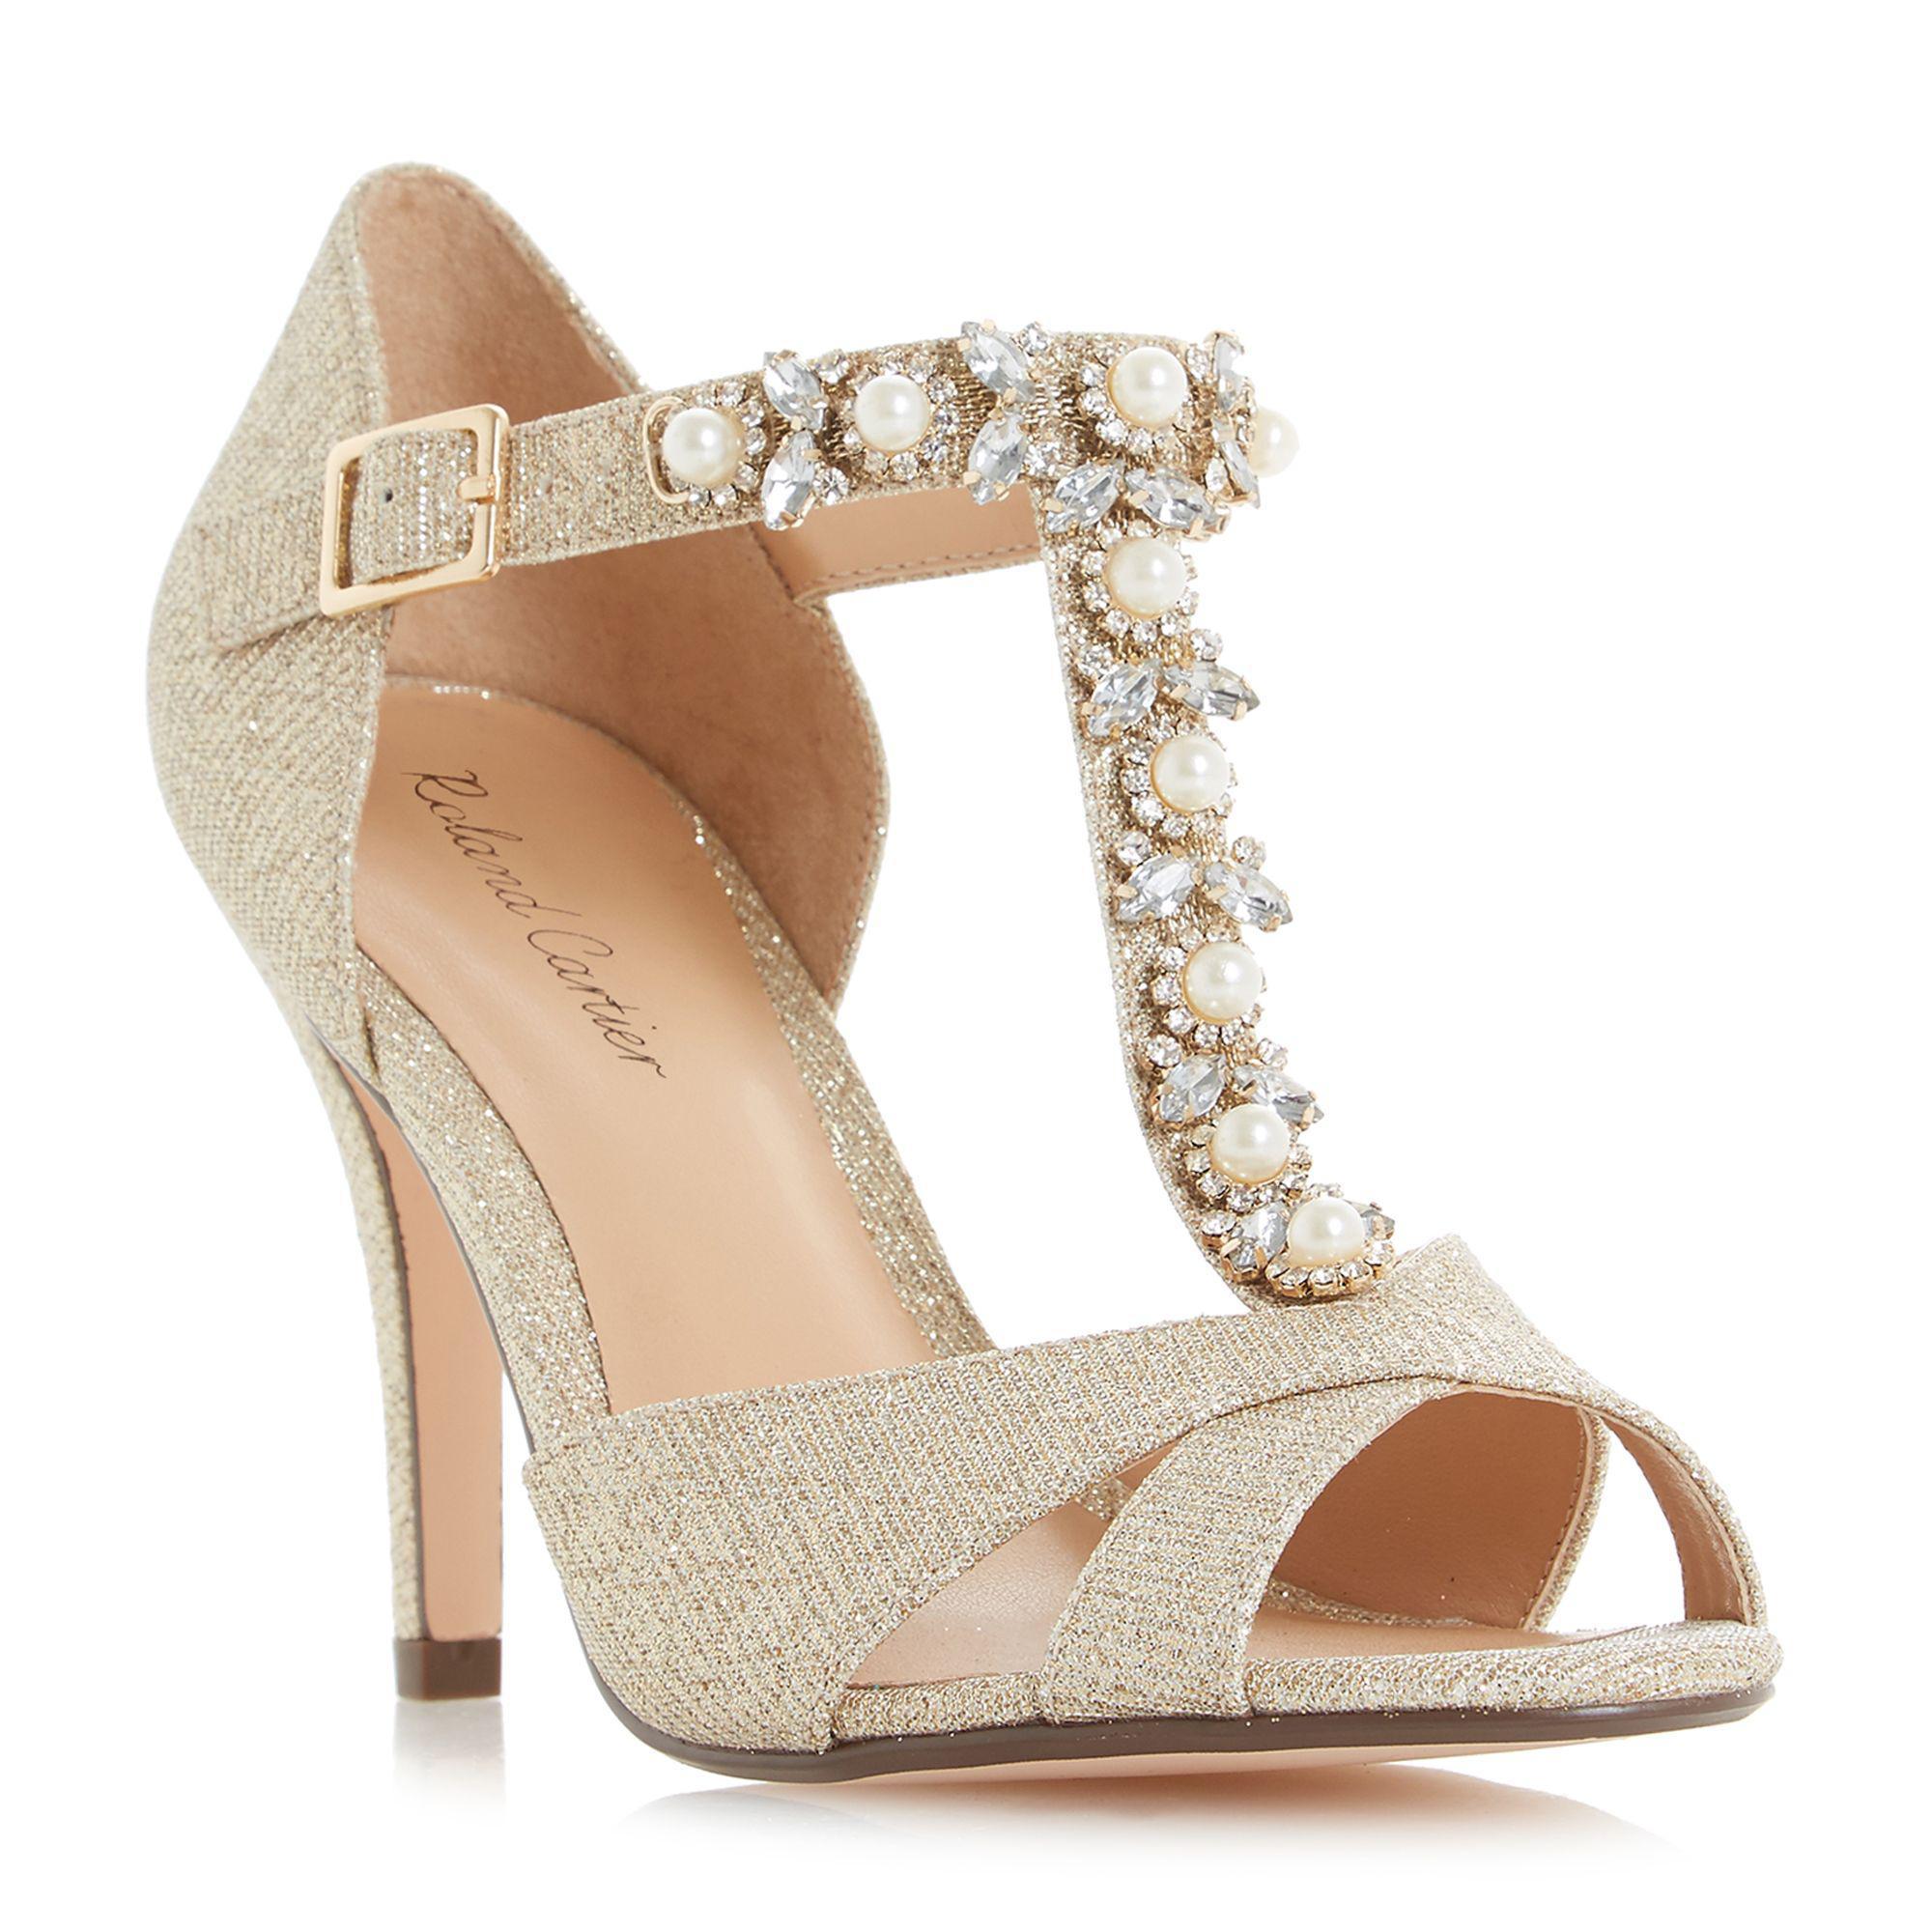 7c6081fd3b8 Roland Cartier Gold Glitter  maddalyn  High Stiletto Heel Court ...